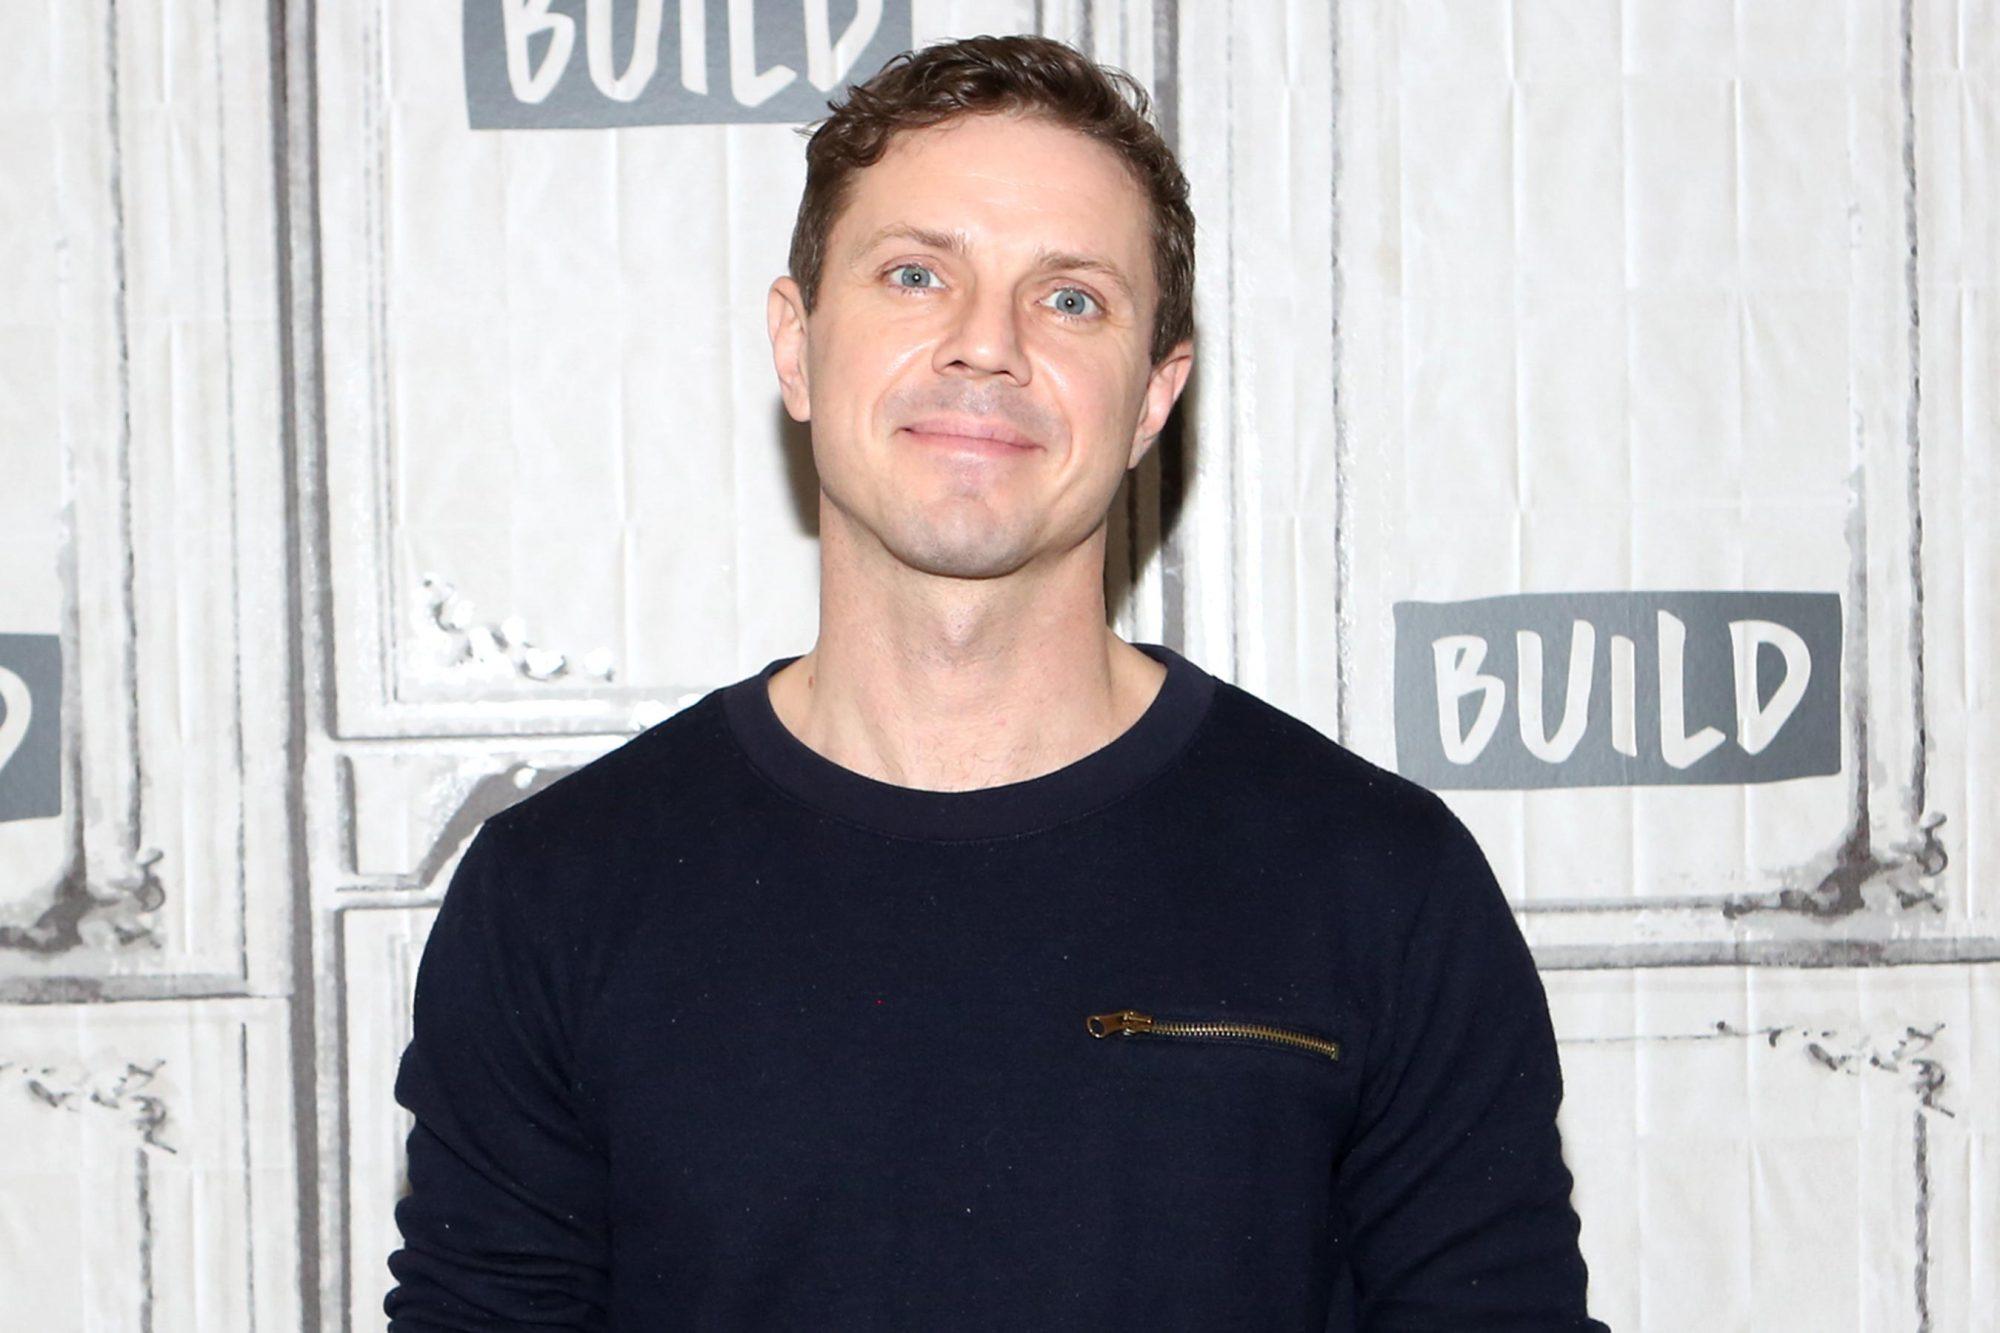 Celebrities Visit Build - February 15, 2018